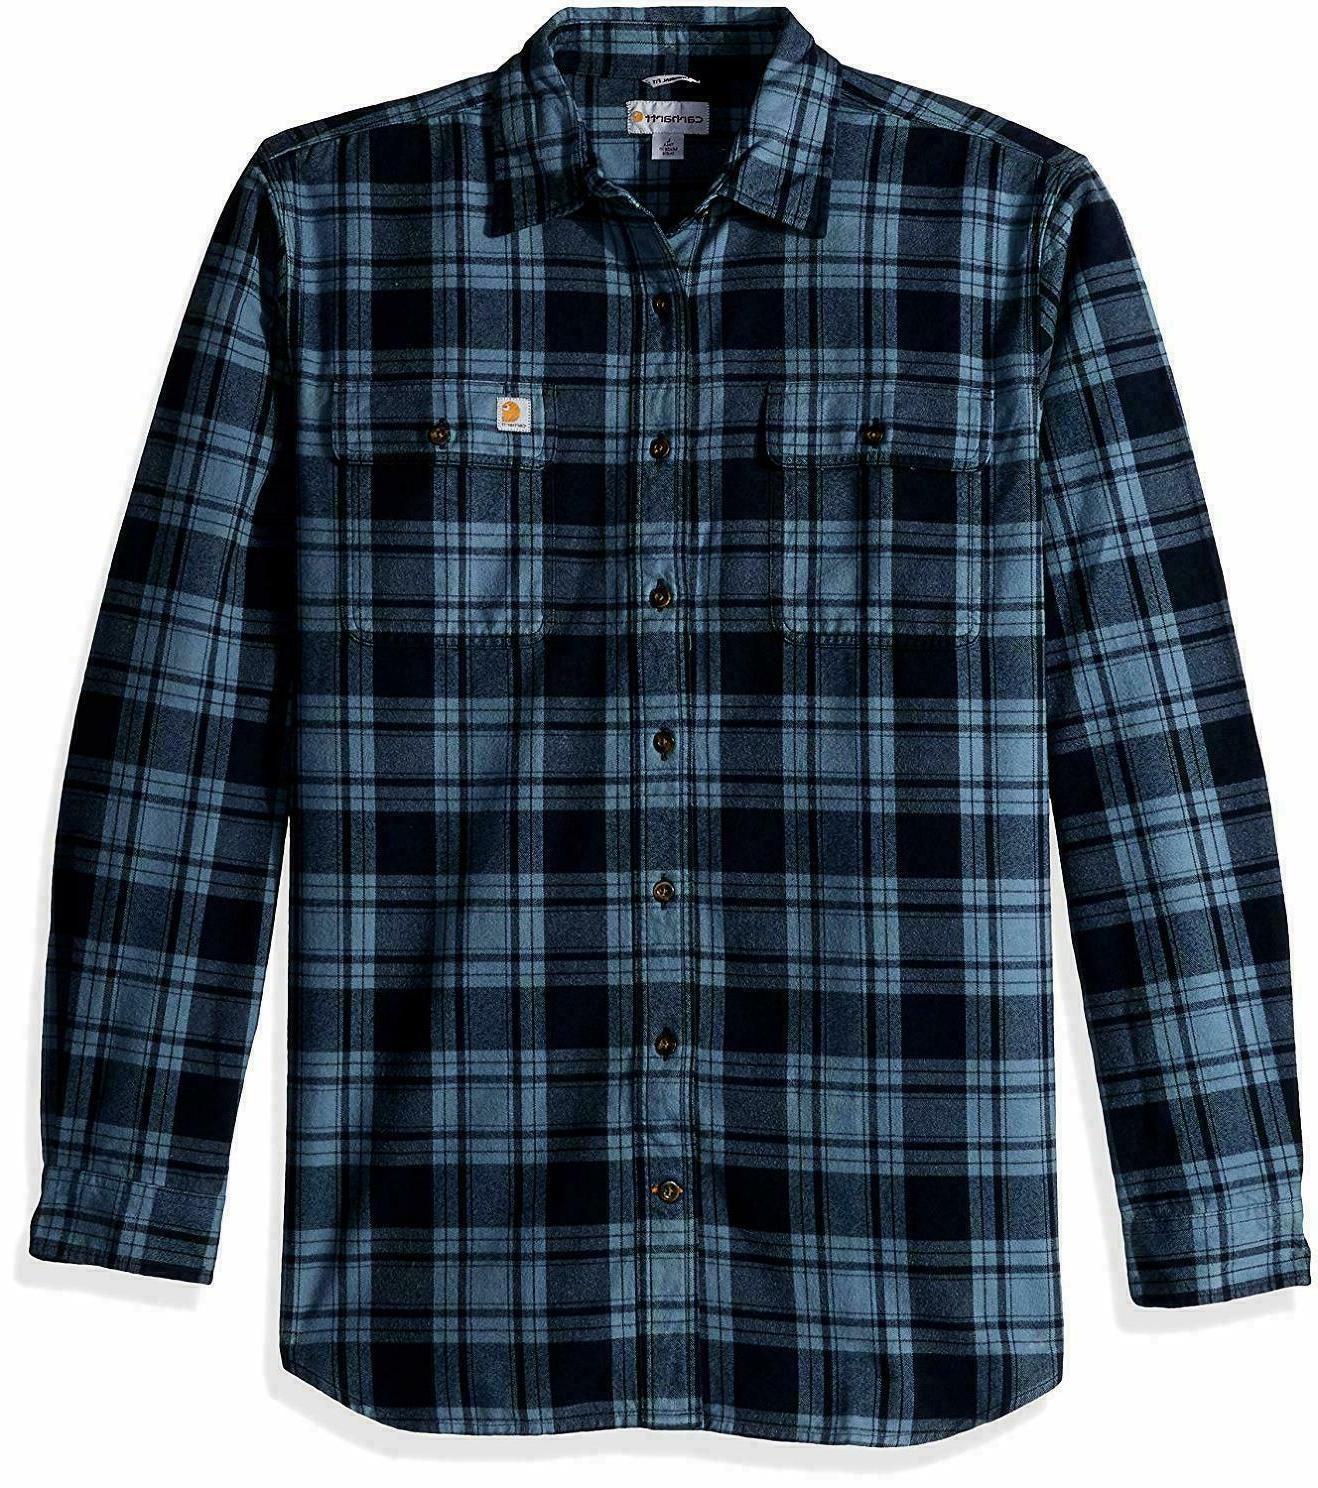 Carhartt Men's Hubbard Plaid Flannel Shirt 103348